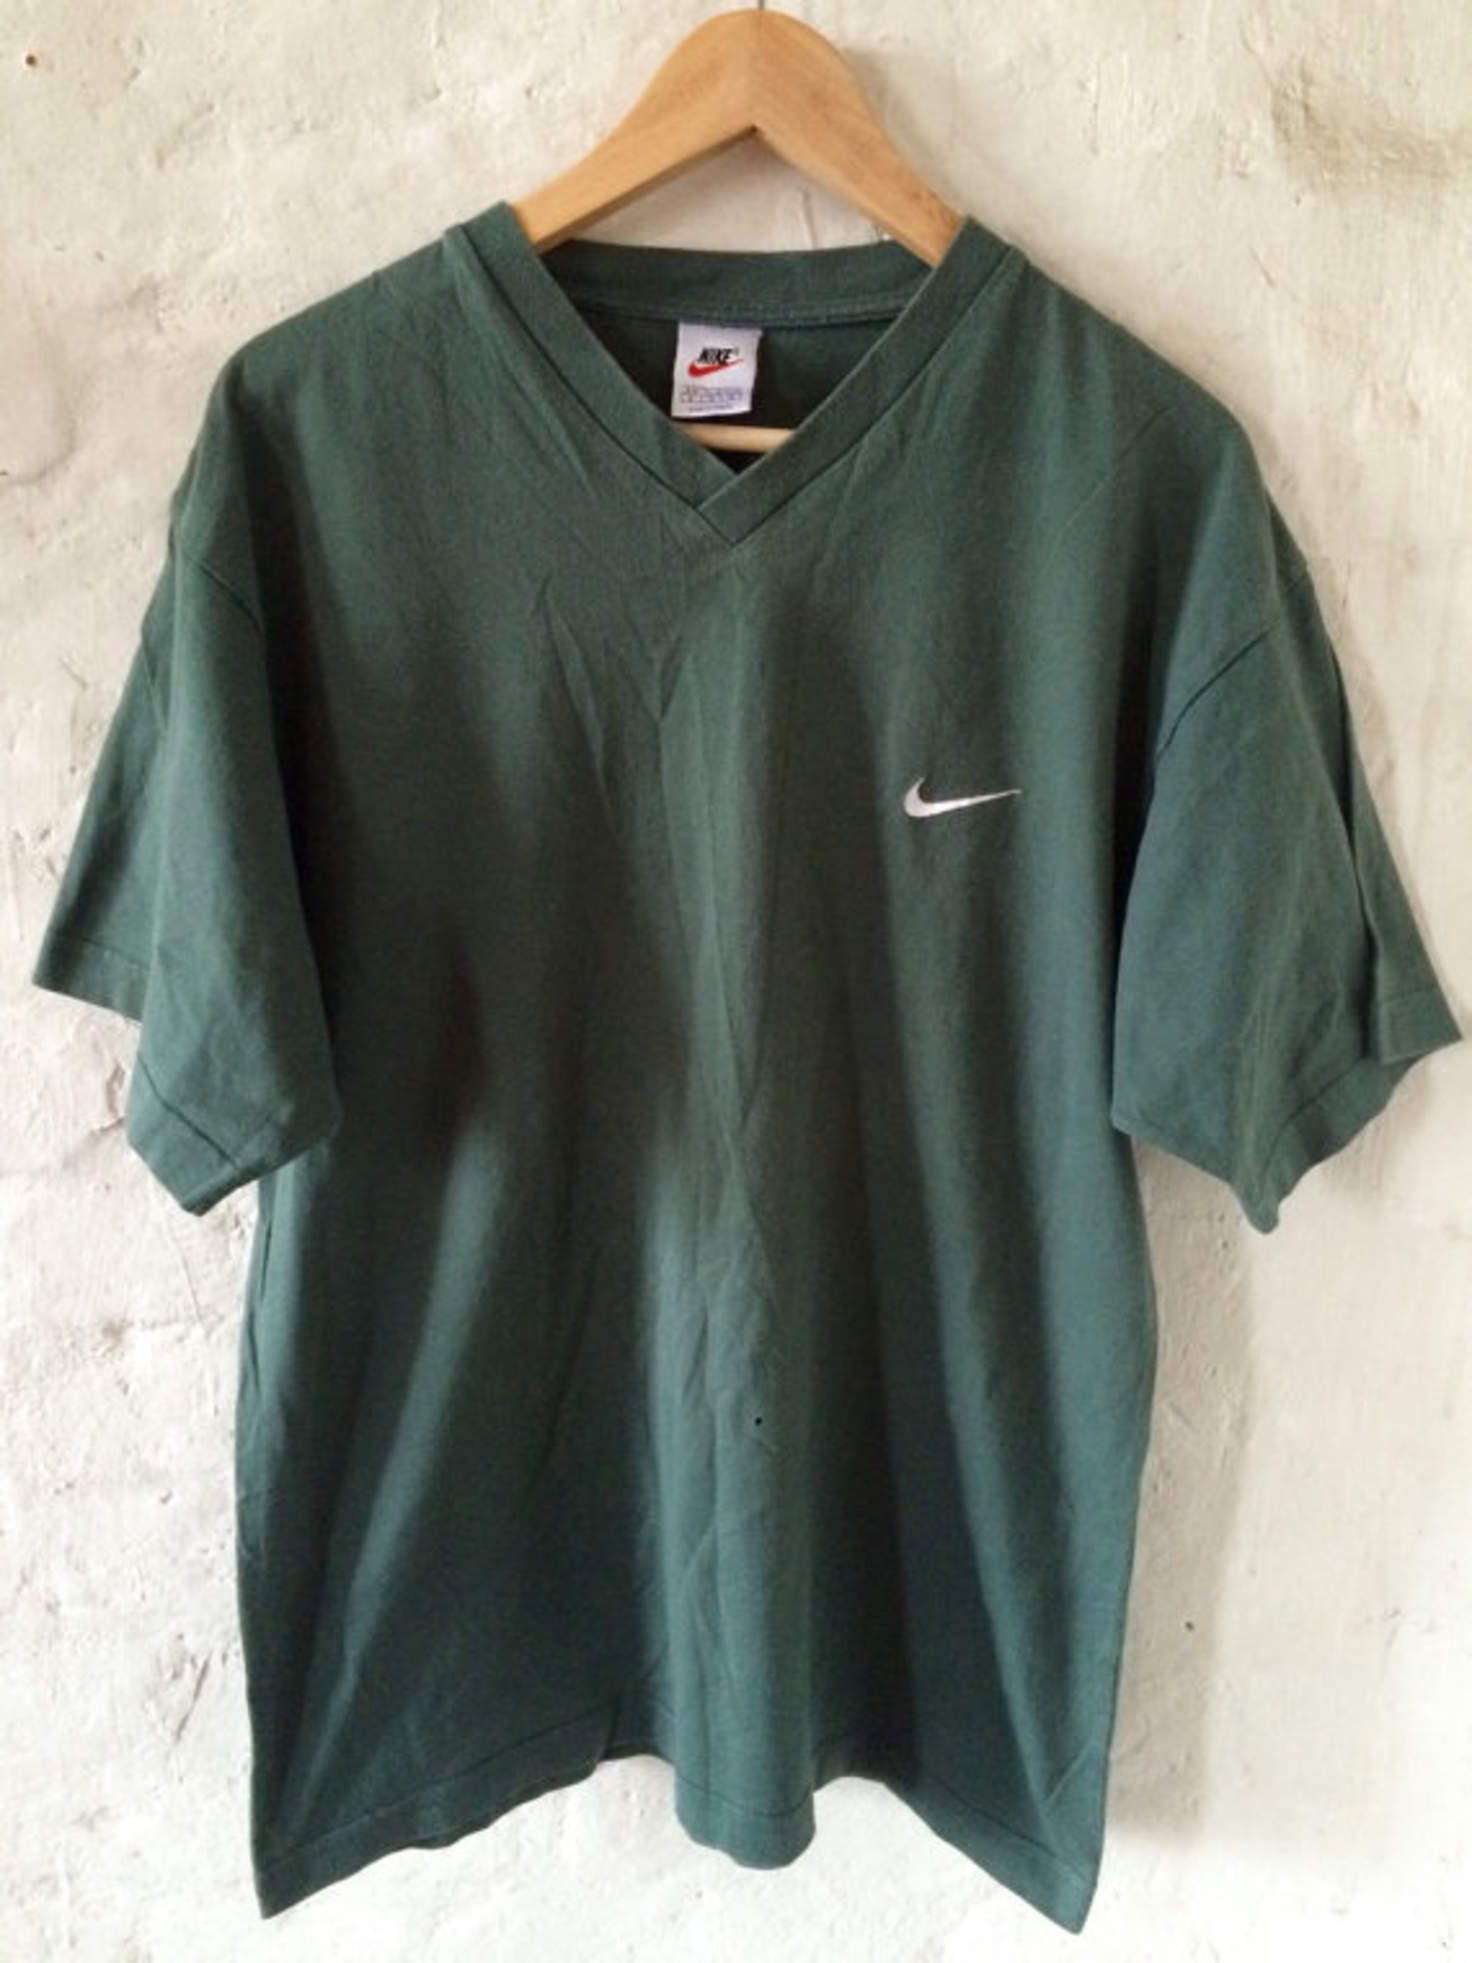 c9330f60e4a70 Vintage Nike T-shirt / Shirt / V-neck Green Medium 90's   Wishlist ...